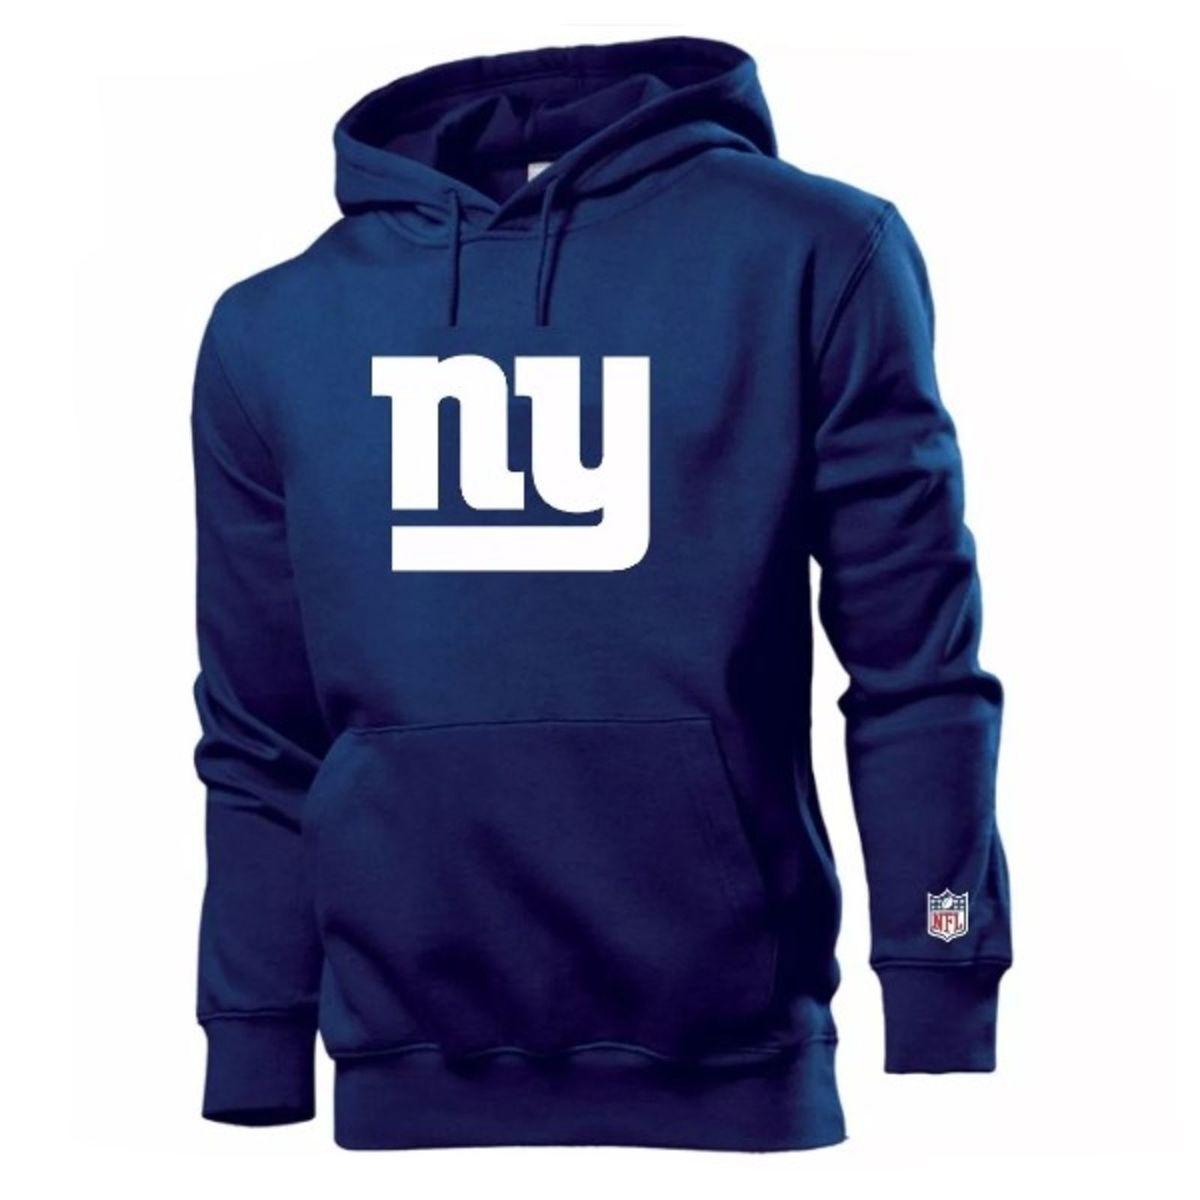 8b23e61760 blusa moleton new york giants nfl - tamanho g - casacos nfl